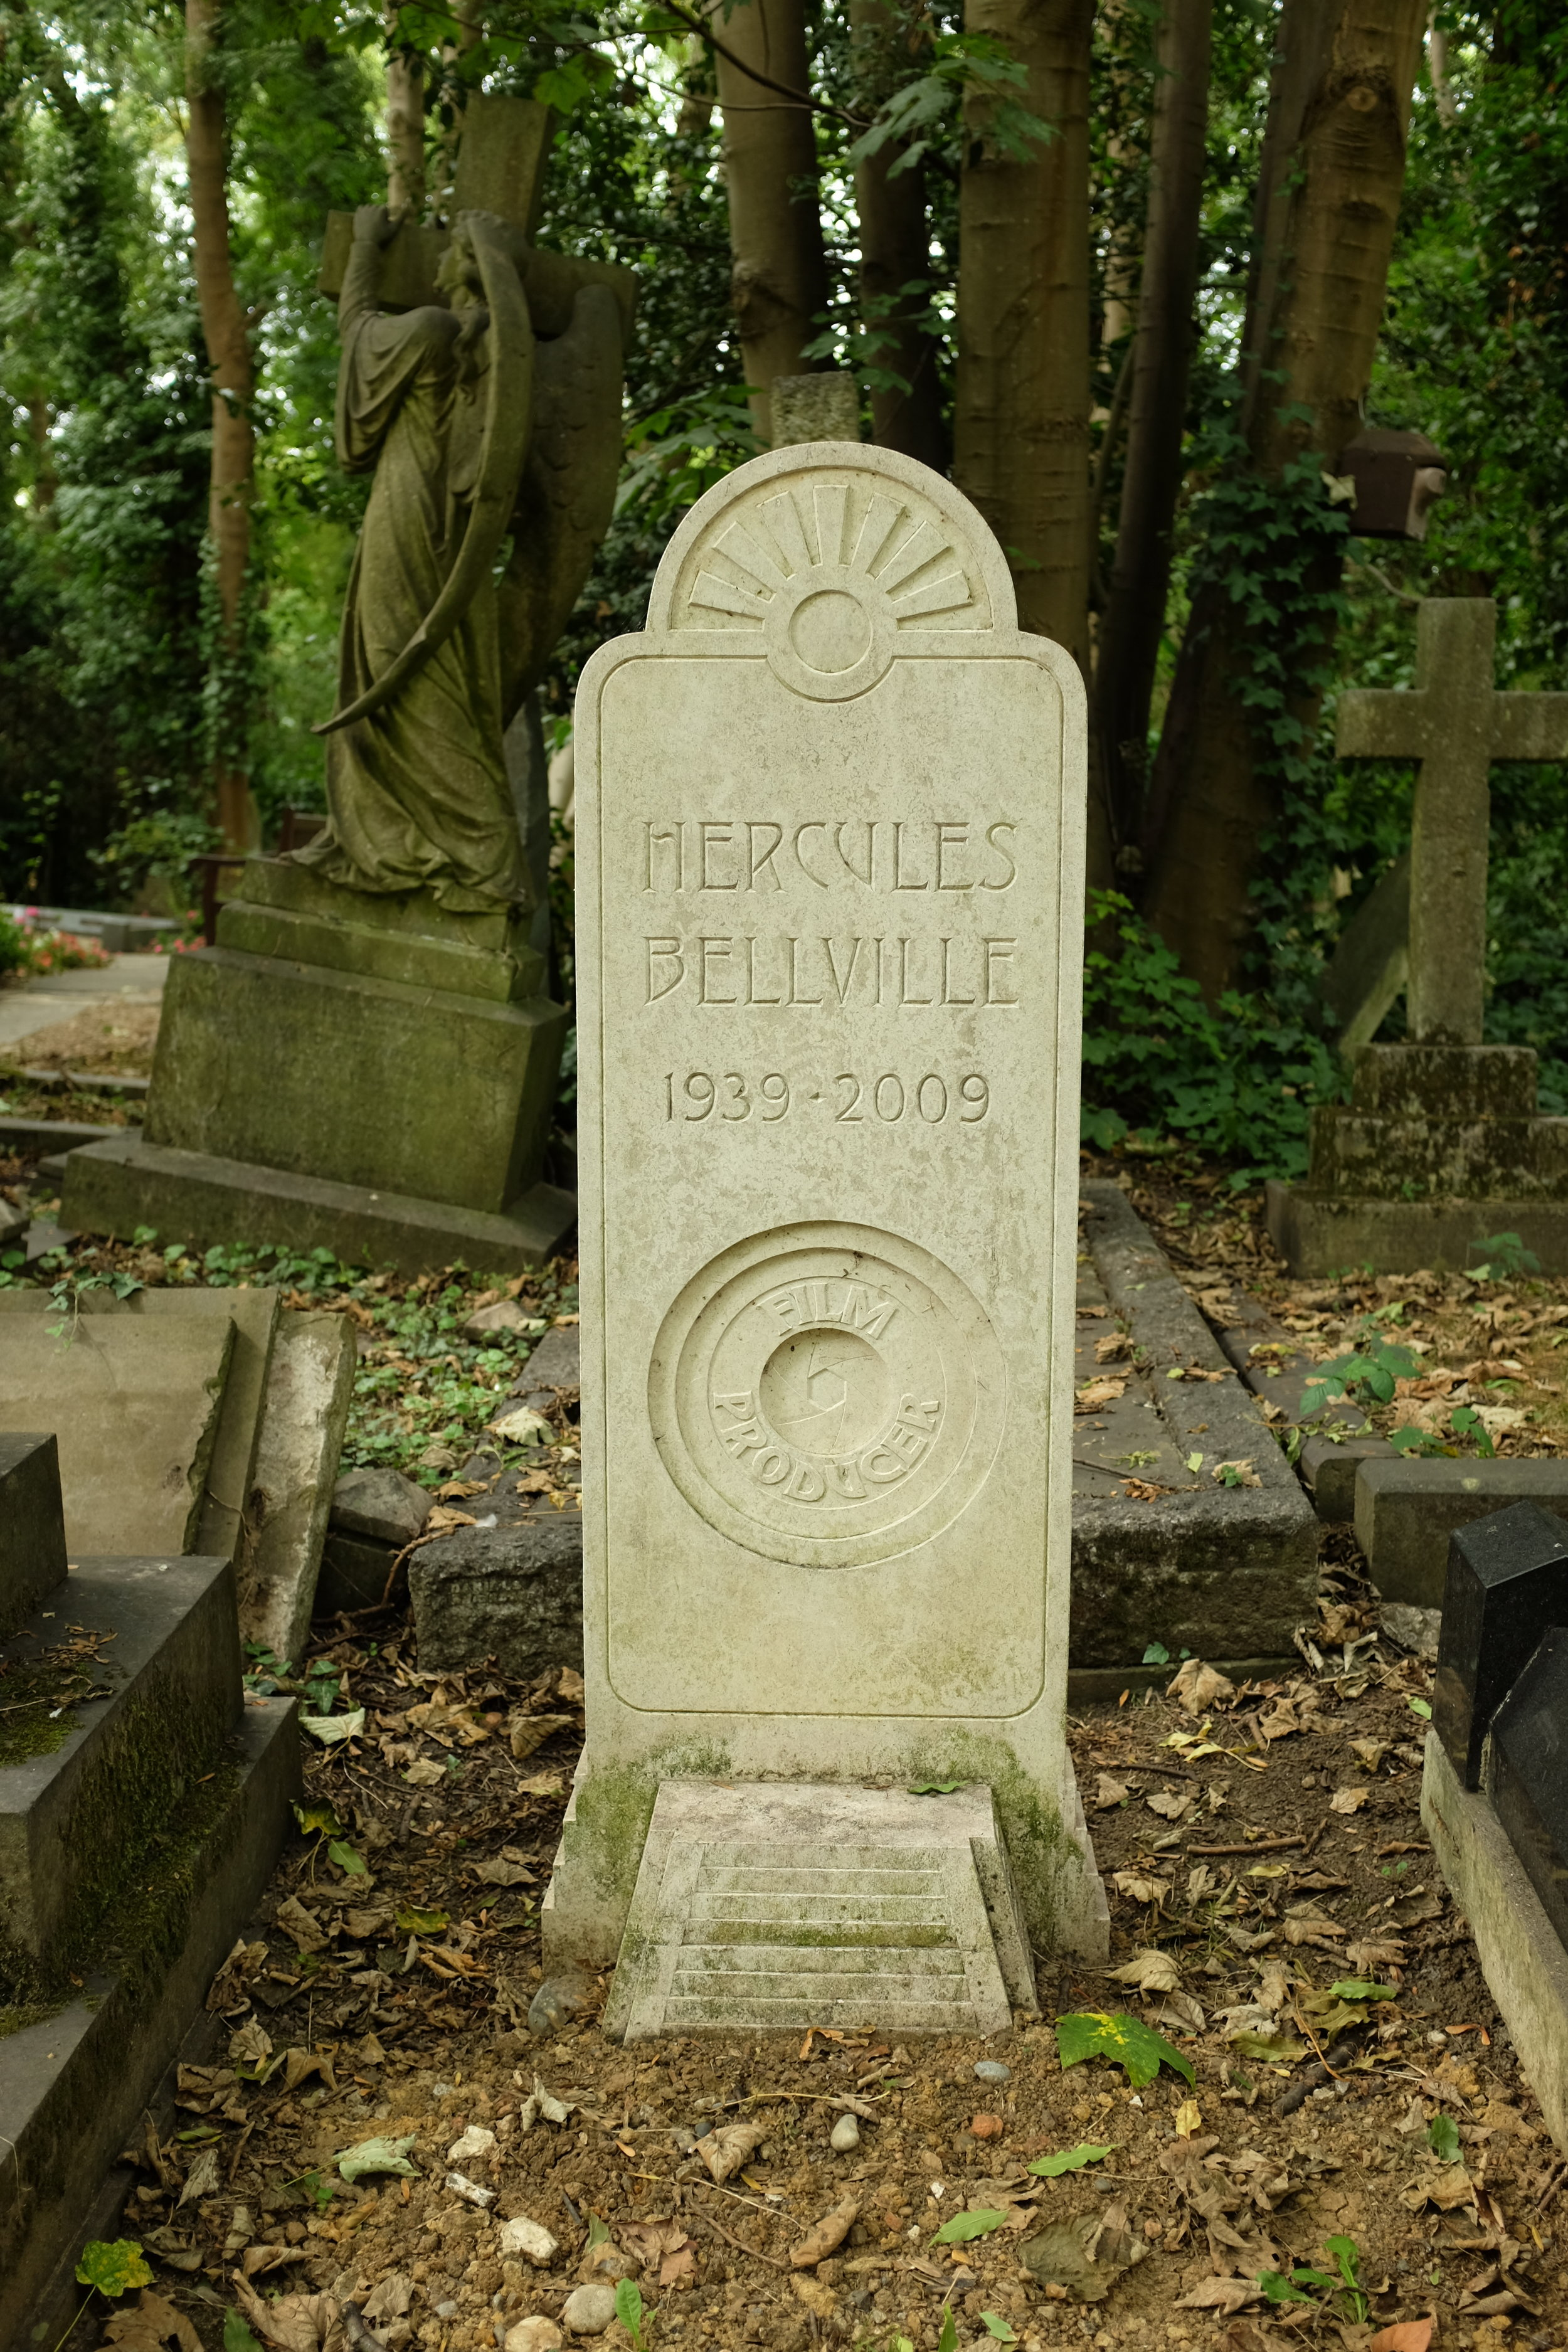 Hercules Bellville